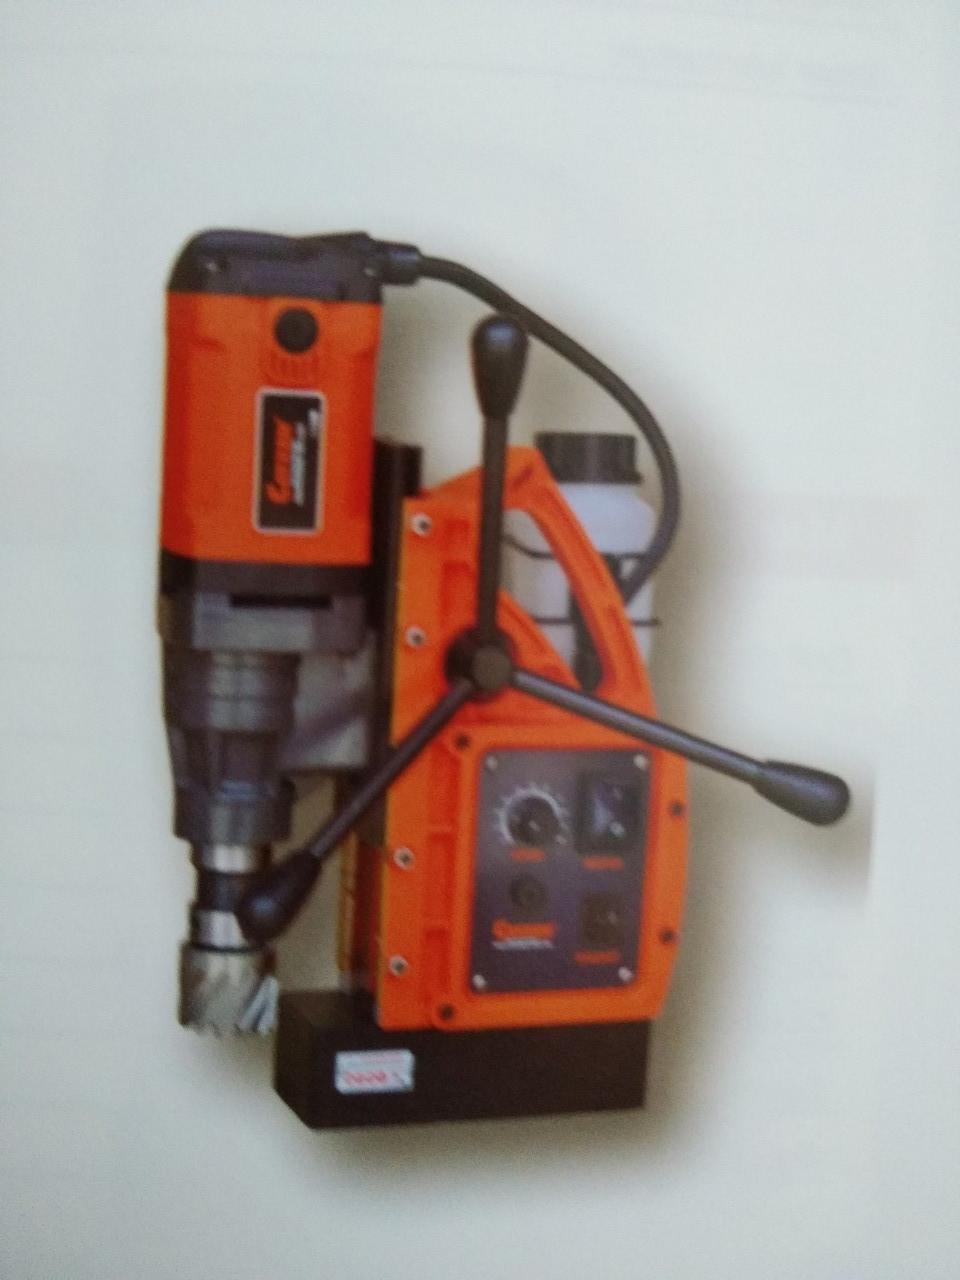 Магнитная дрель по металлу, Сayken SCY-35HD